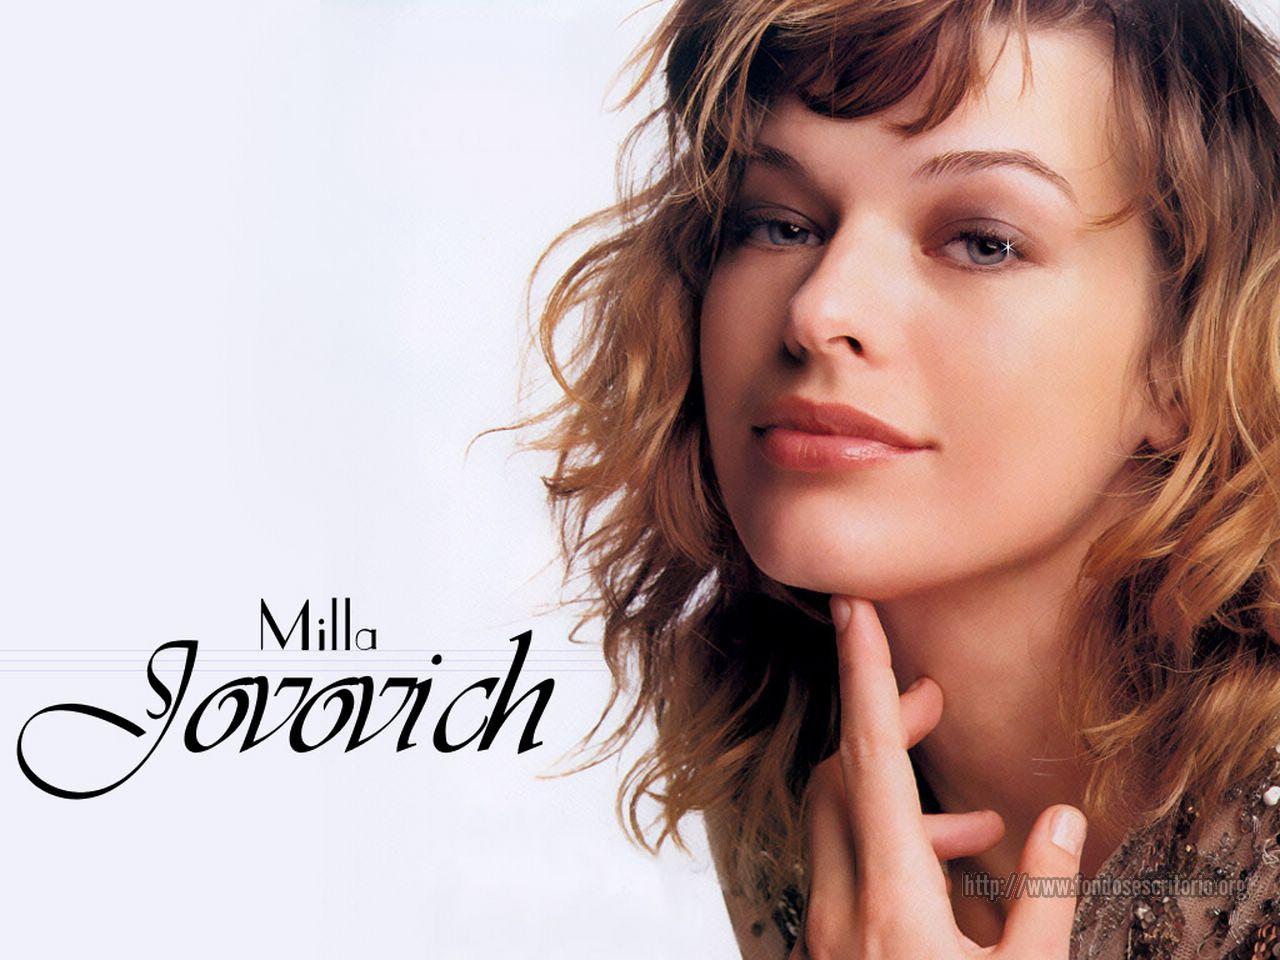 http://3.bp.blogspot.com/-26mivj3wV5g/TyBKPTjafxI/AAAAAAAADOs/x_x1W_Tgebg/s1600/Milla+Jovovich.jpg